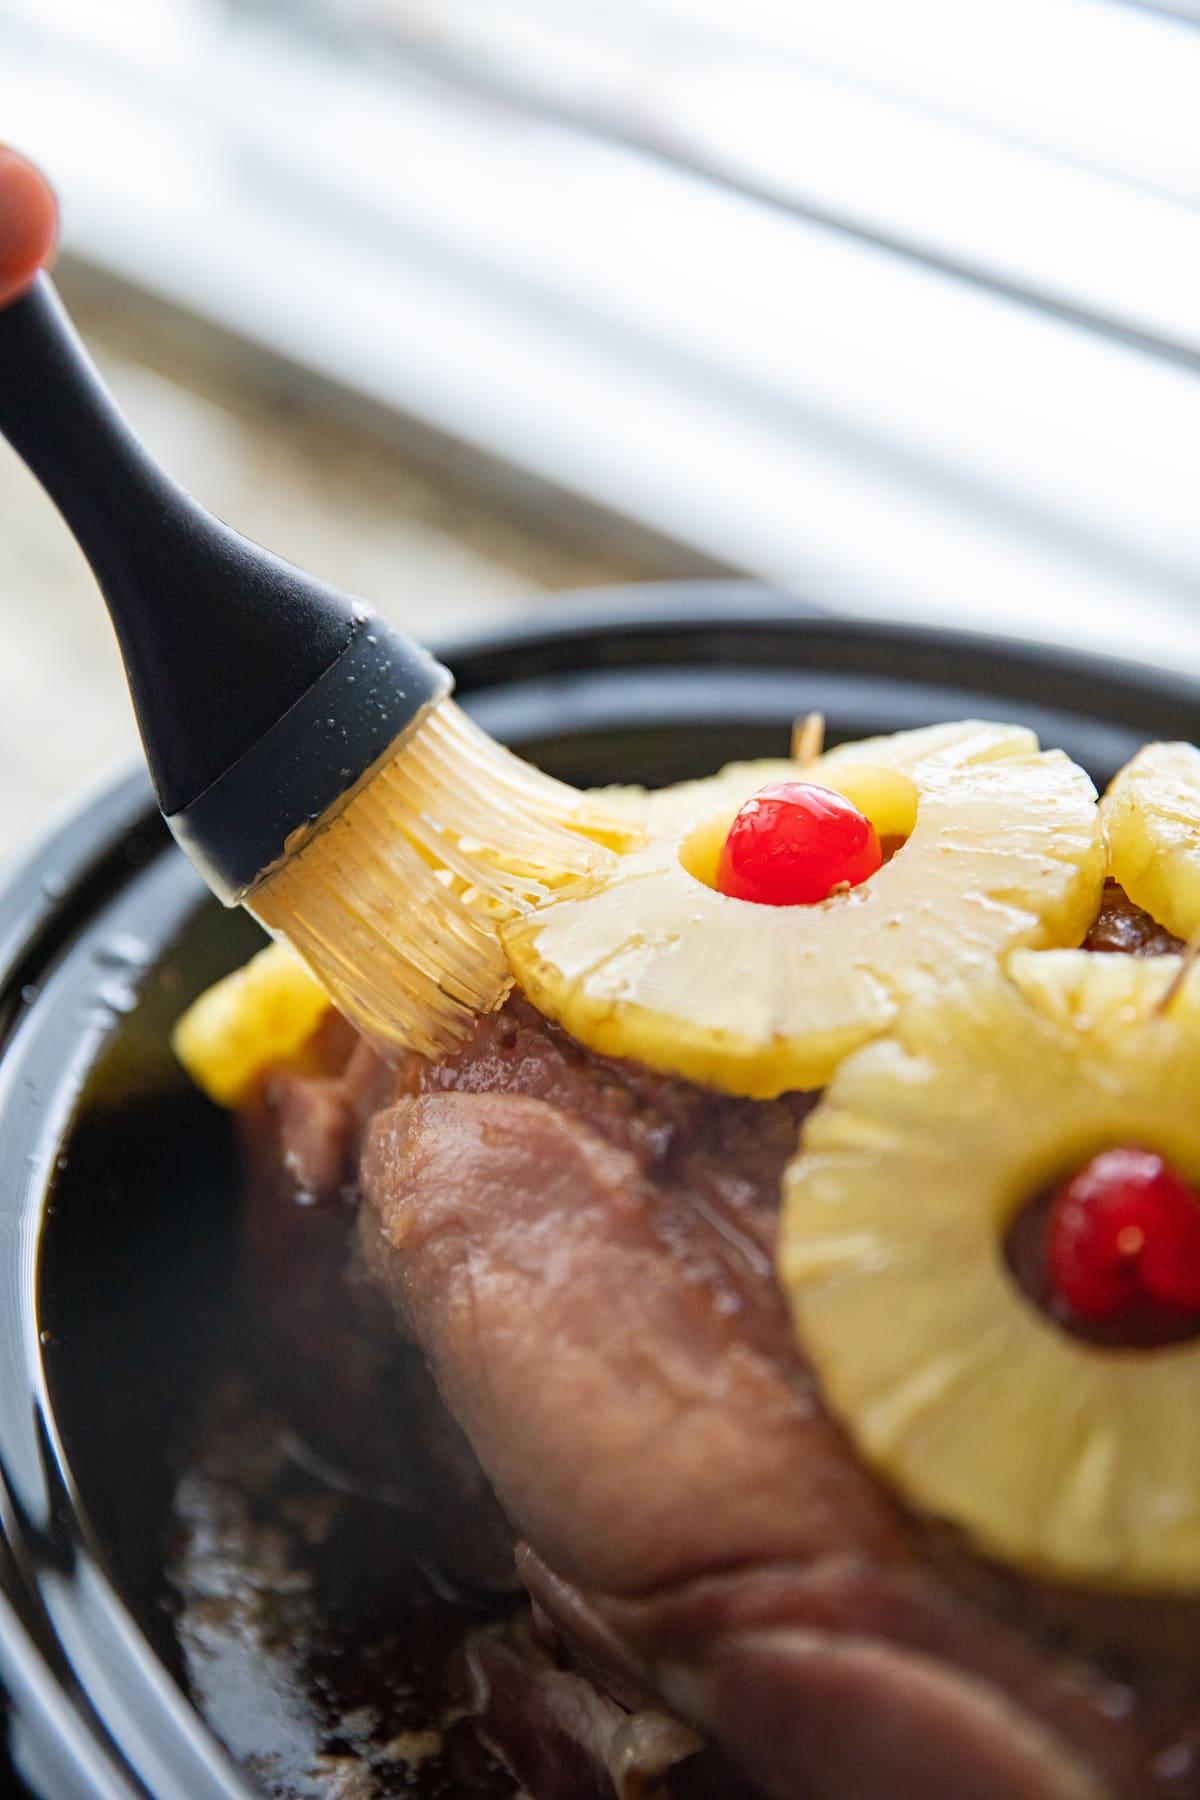 brushing ham in crockpot with glaze